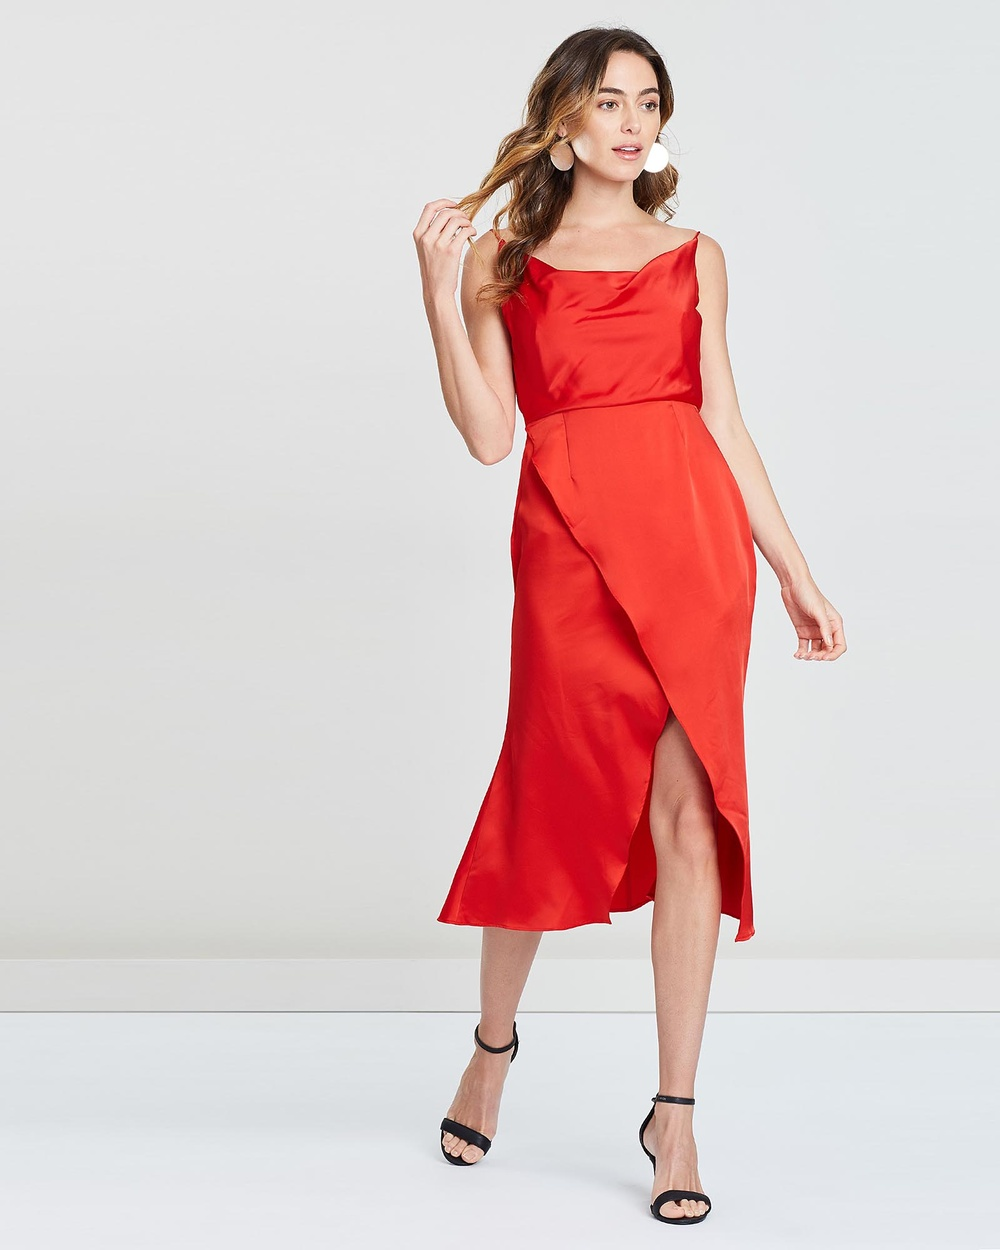 SANTINA-NICOLE Red Freya Cowl Neck Satin Dress